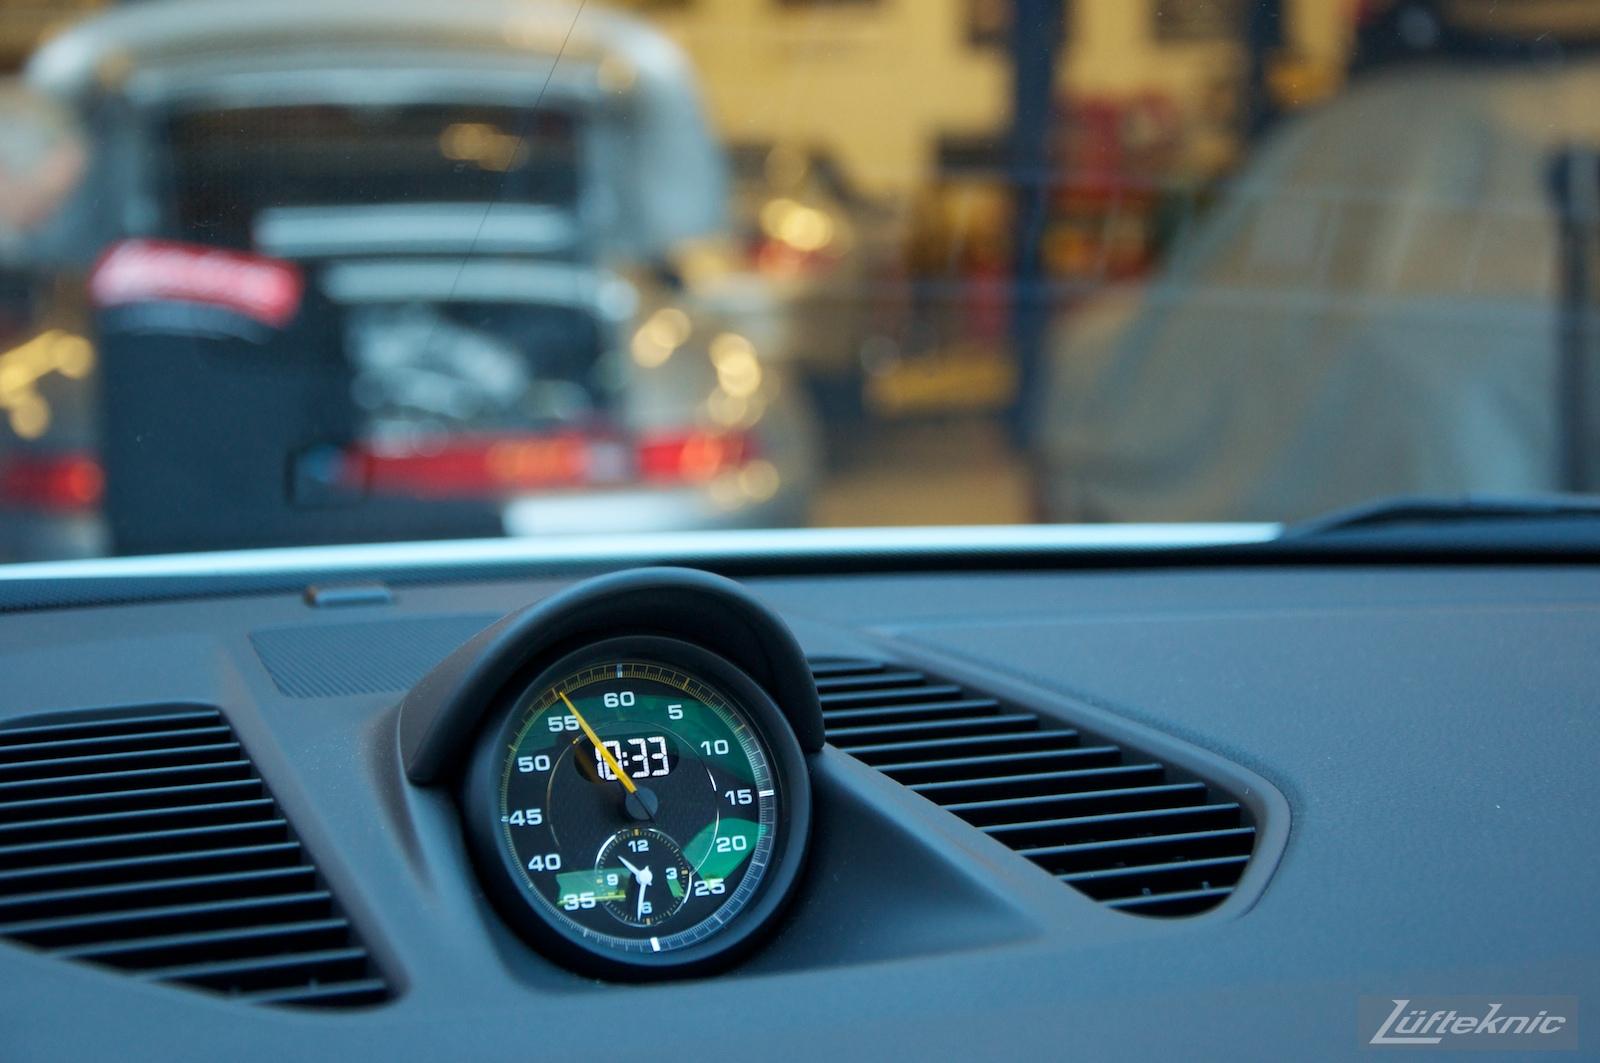 Sport Chrono clock and dash display on the Lüfteknic Porsche 991 GT3